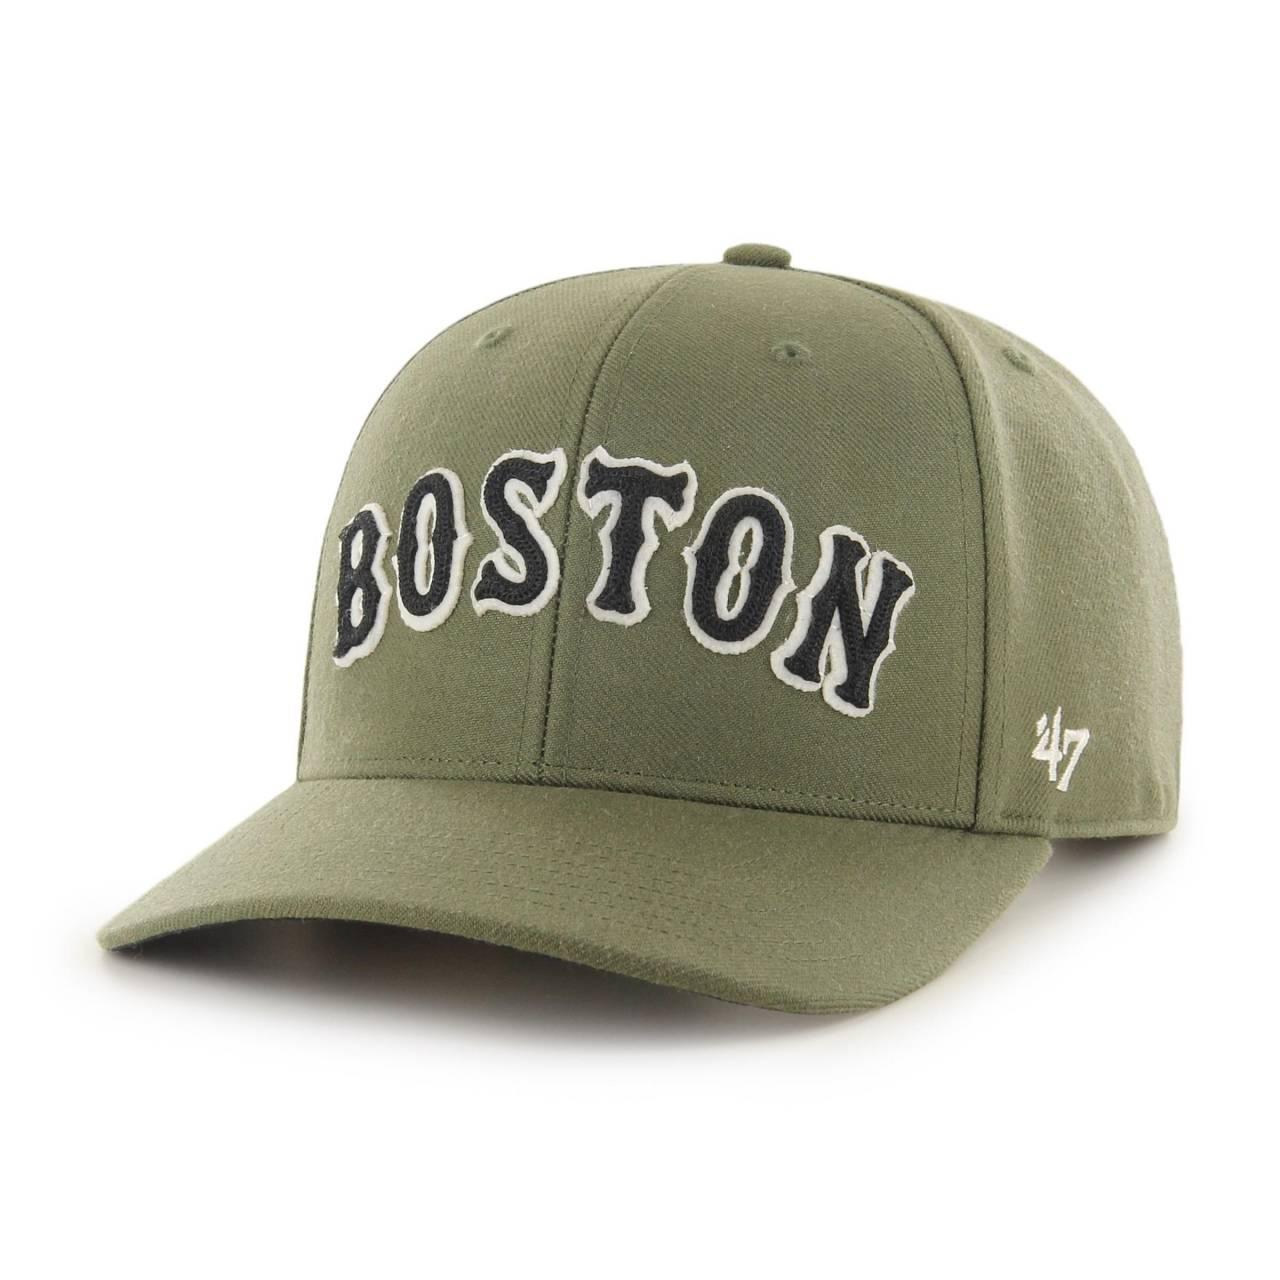 MLB BOSTON RED SOX CHAIN LINK '47 MVP DP OLIVE SNAPBACK